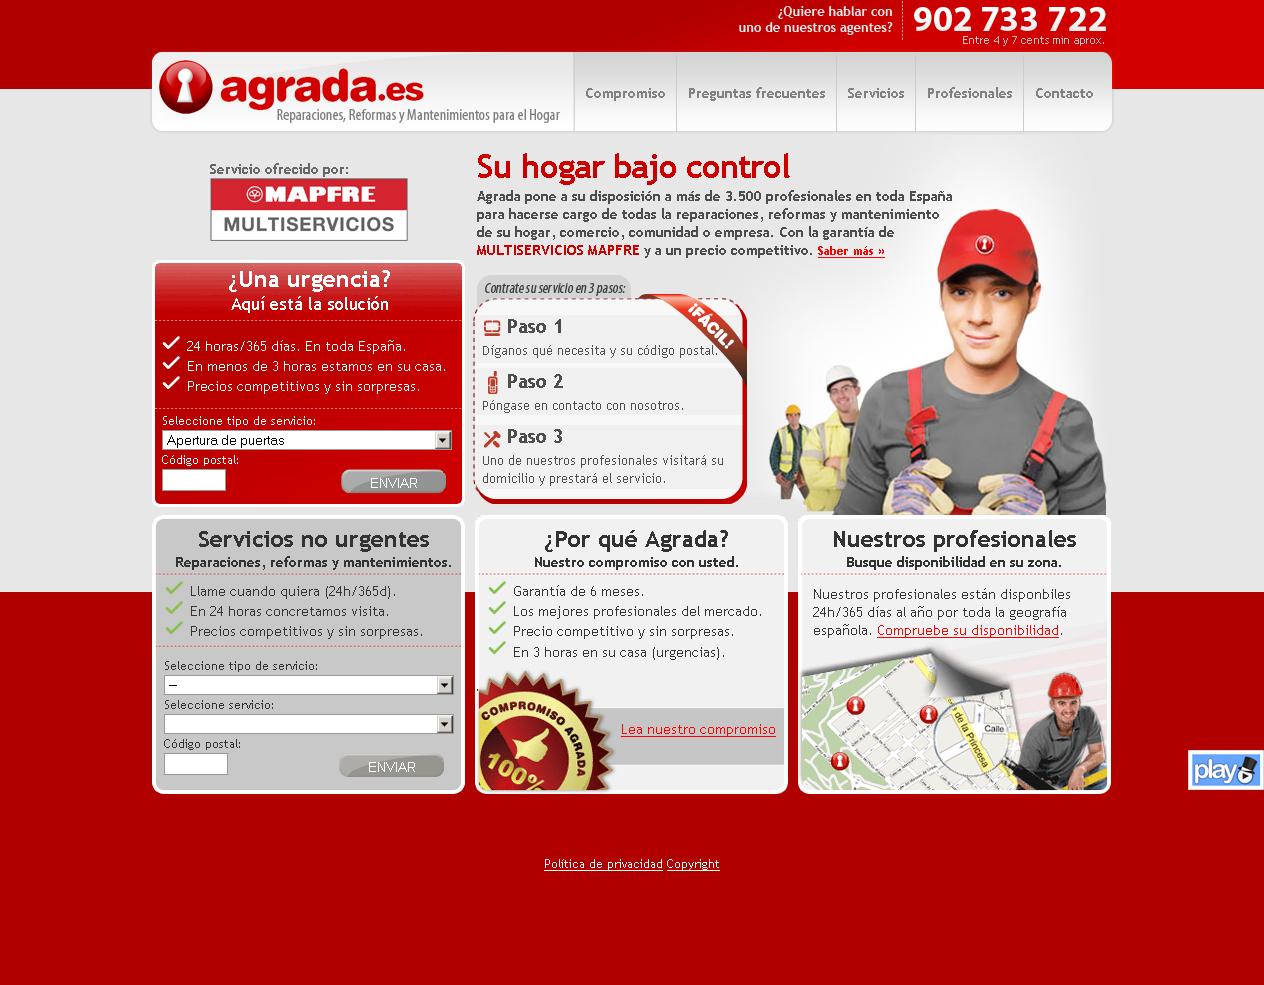 Agrada.es webgune berria